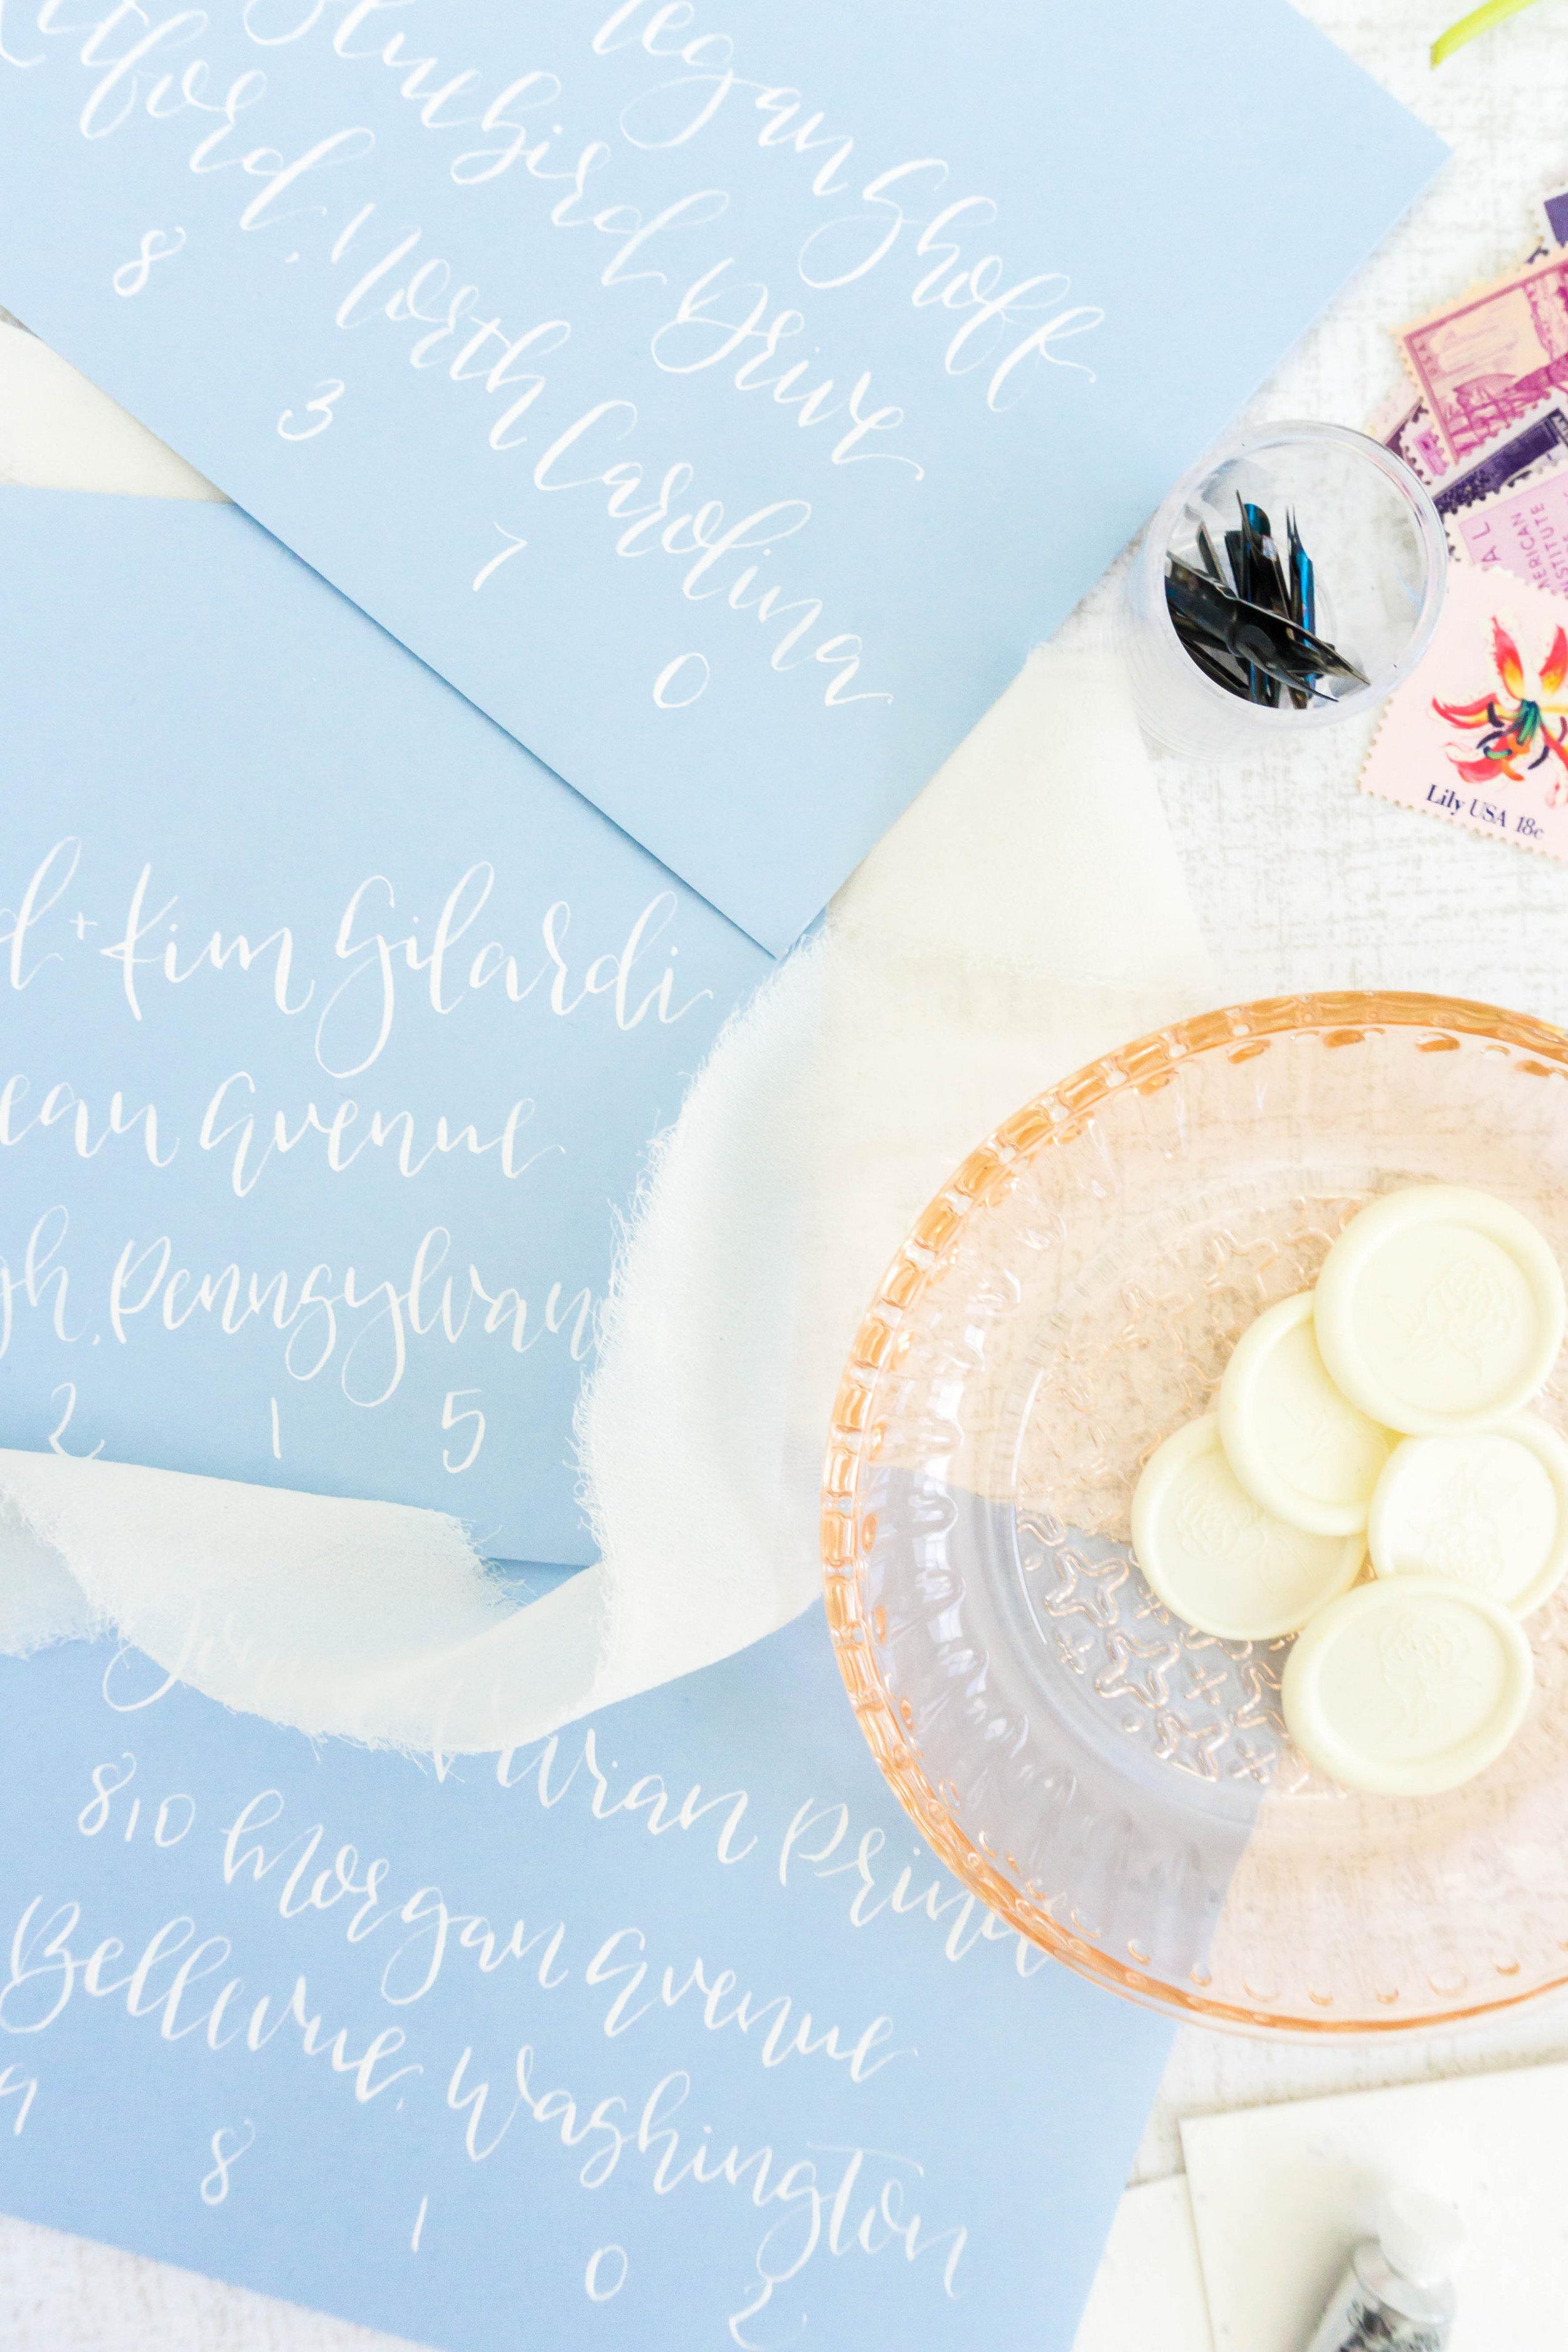 love-fern-design-studio-custom-wedding-invitations-for-the-modern-couple-modern-calligraphy-in-seattle-washington-custom-wedding-stationery-french-blue-calligraphy-envelopes-white-ink